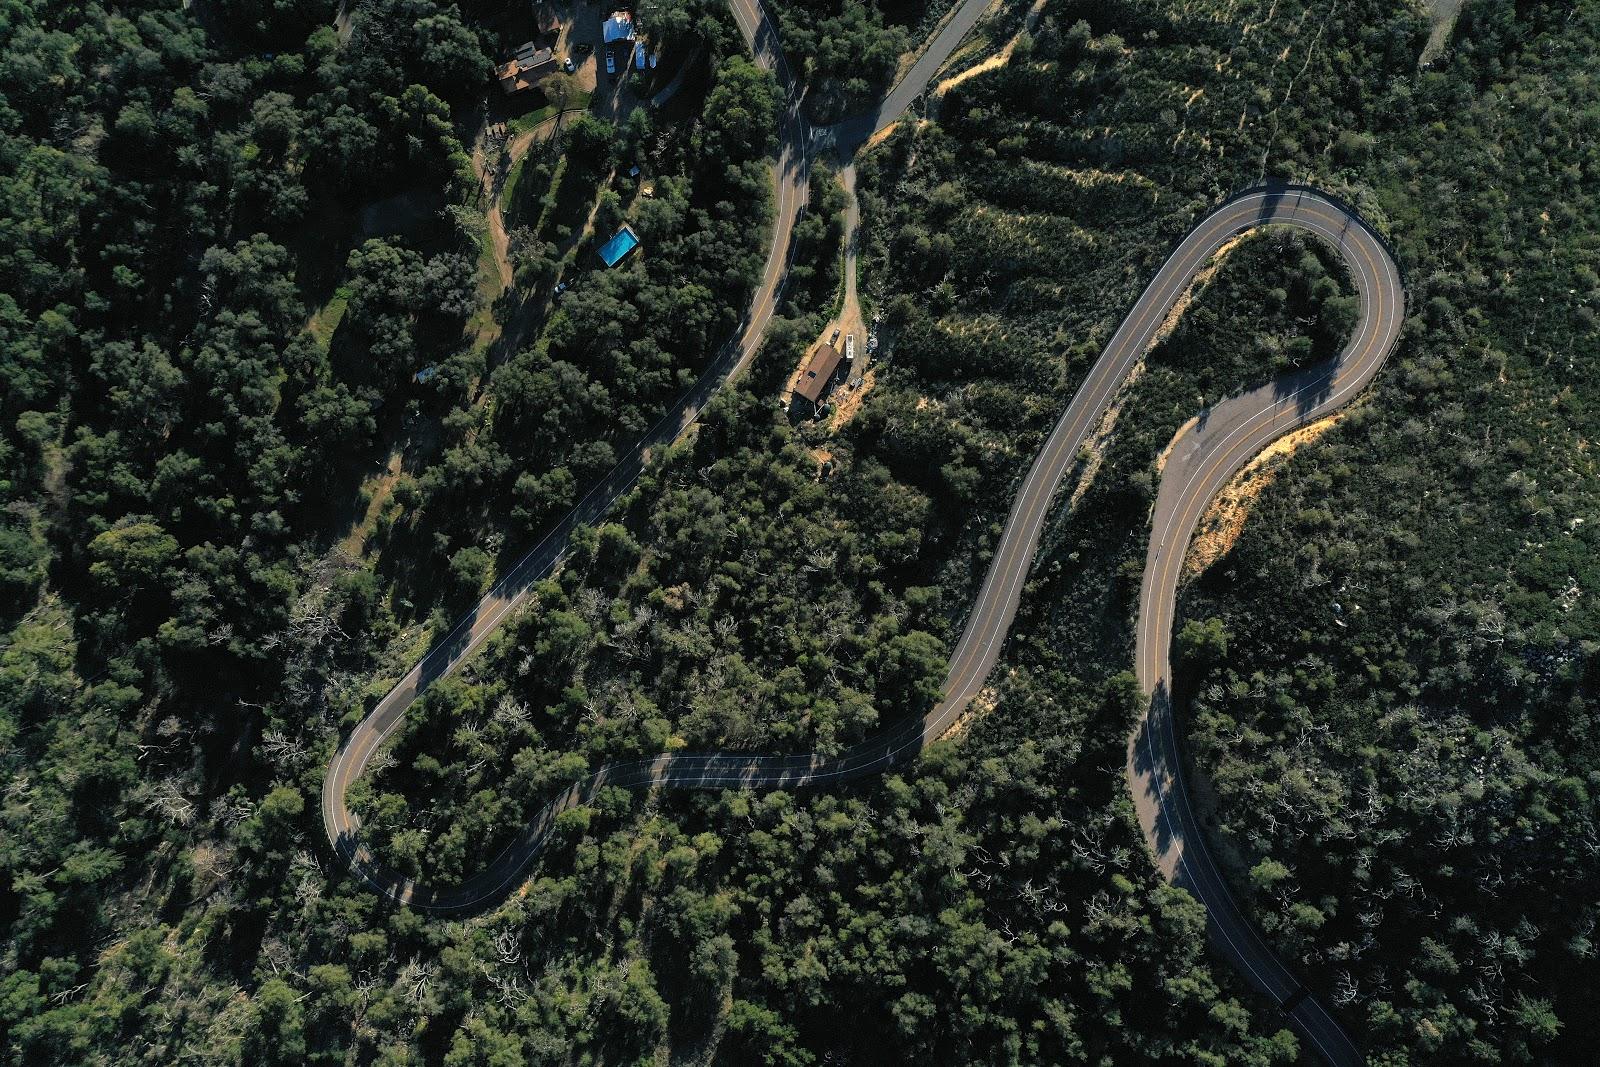 Aerial drone photo of Palomar Mountain hairpin